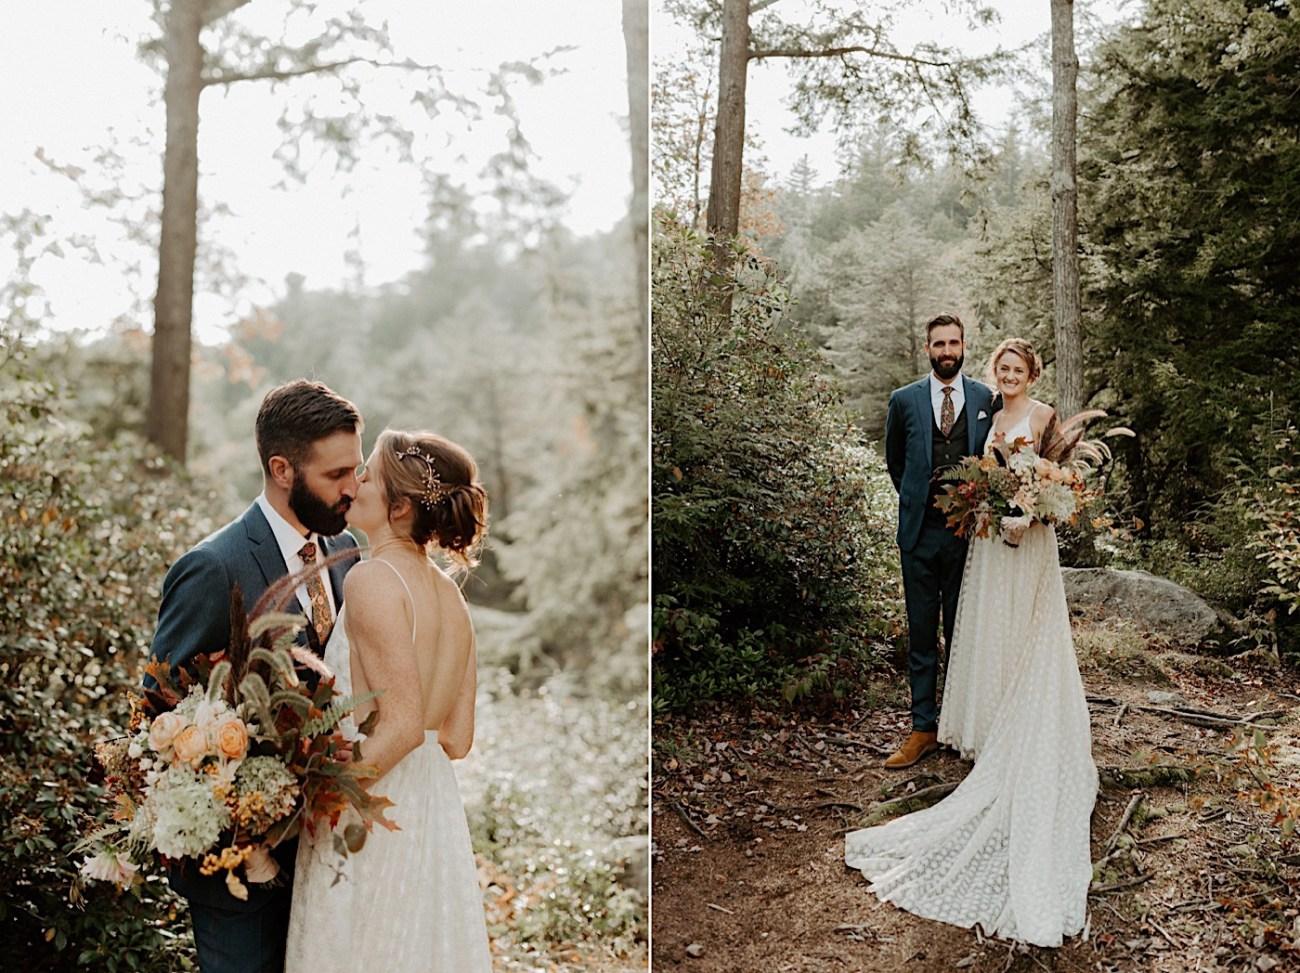 Destination Lakeside Wedding Mt Washington Wedding Outdoor Wedding Boston Wedding Photographer 032